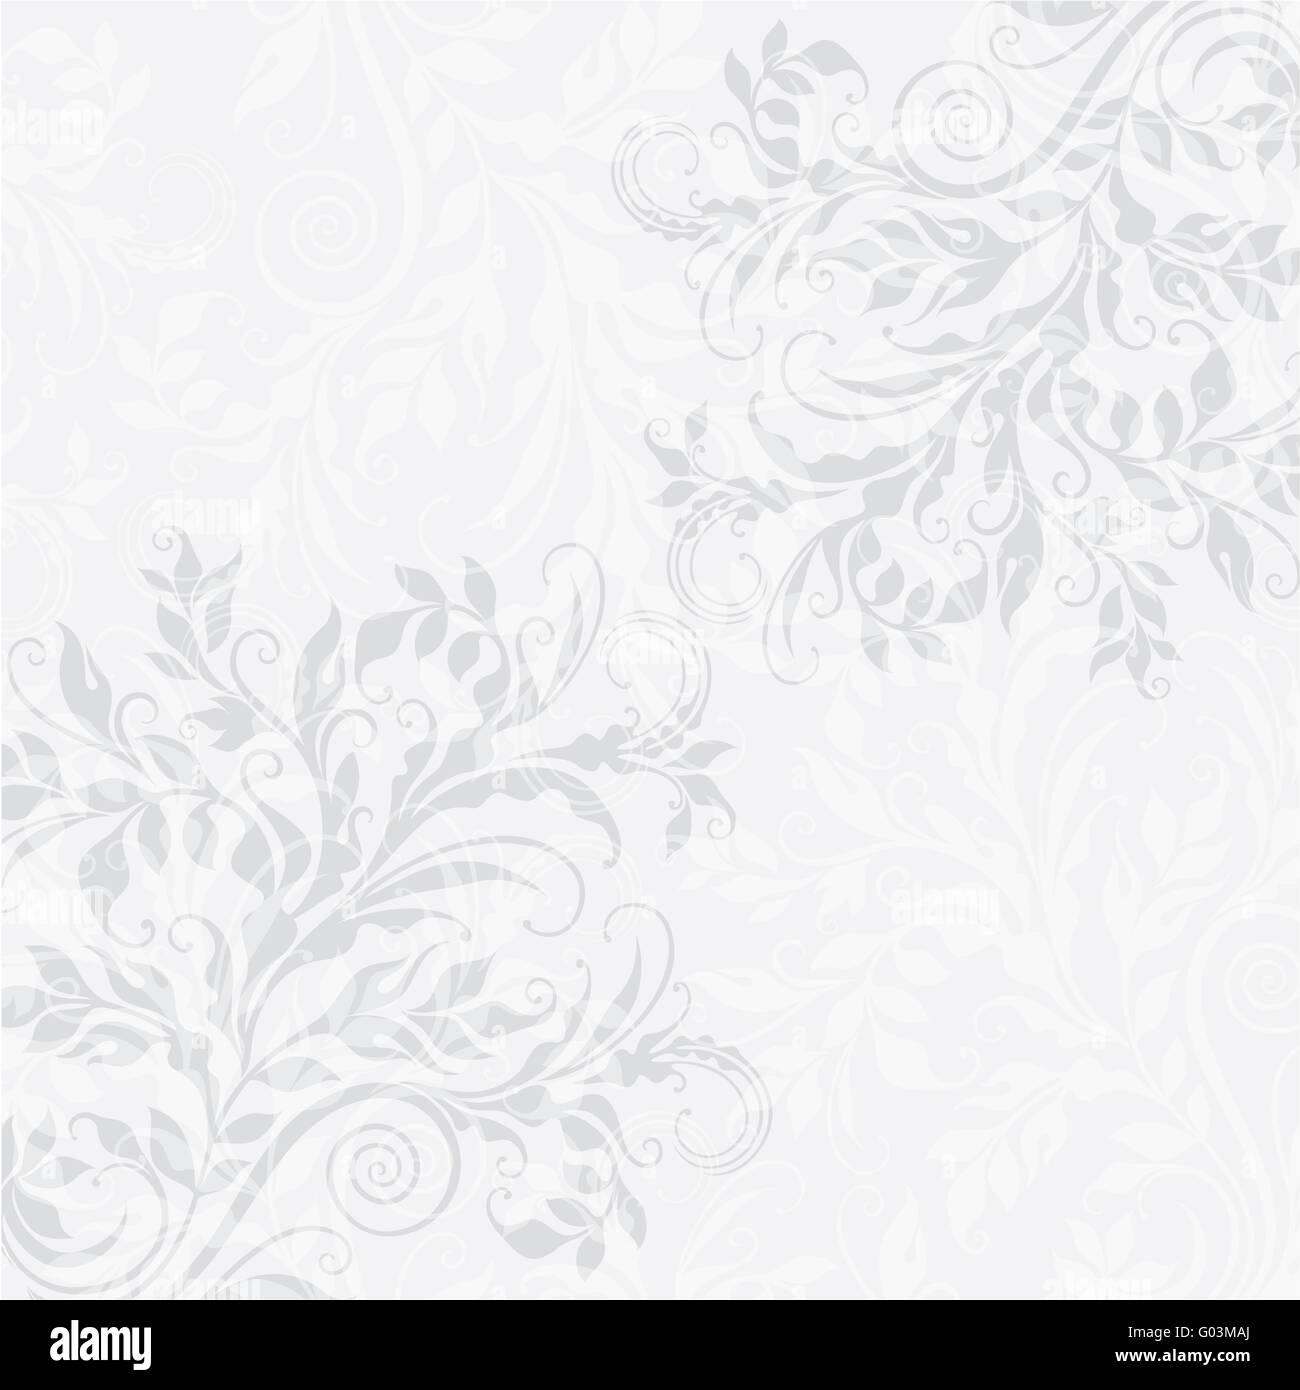 EPS10 fondo floral decorativo Imagen De Stock